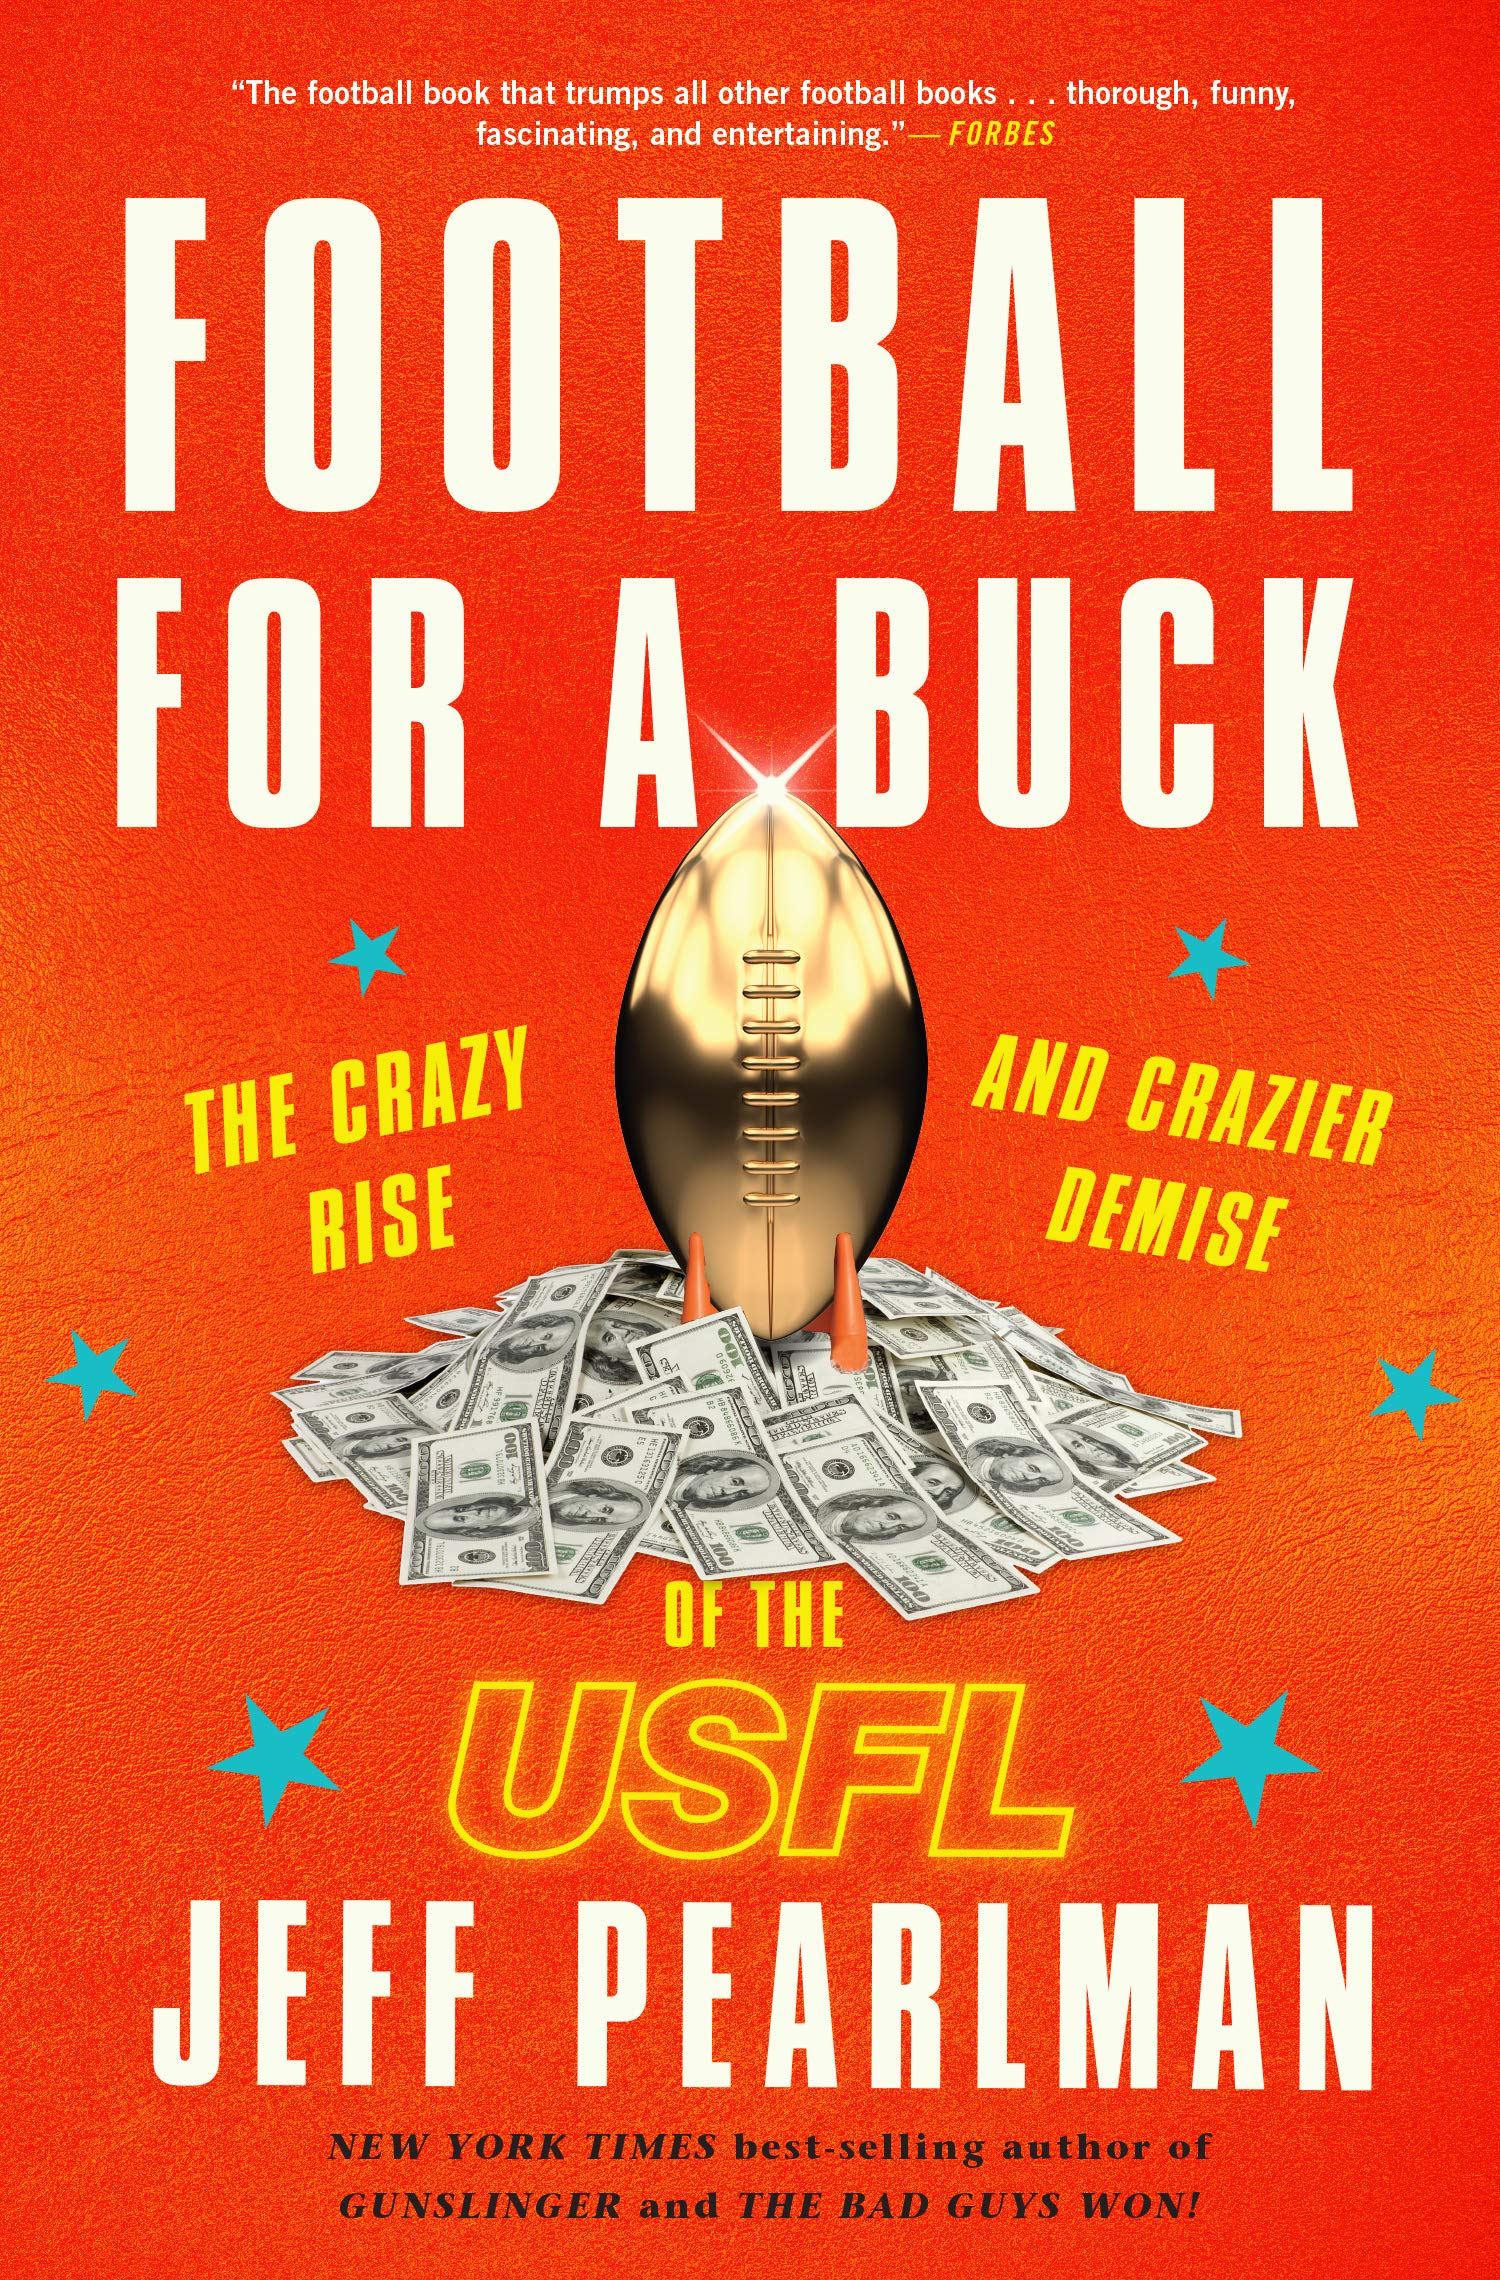 NEW JERSEY GENERALS 1983-85 USFL Football Helmet ACCESSORY DECALS